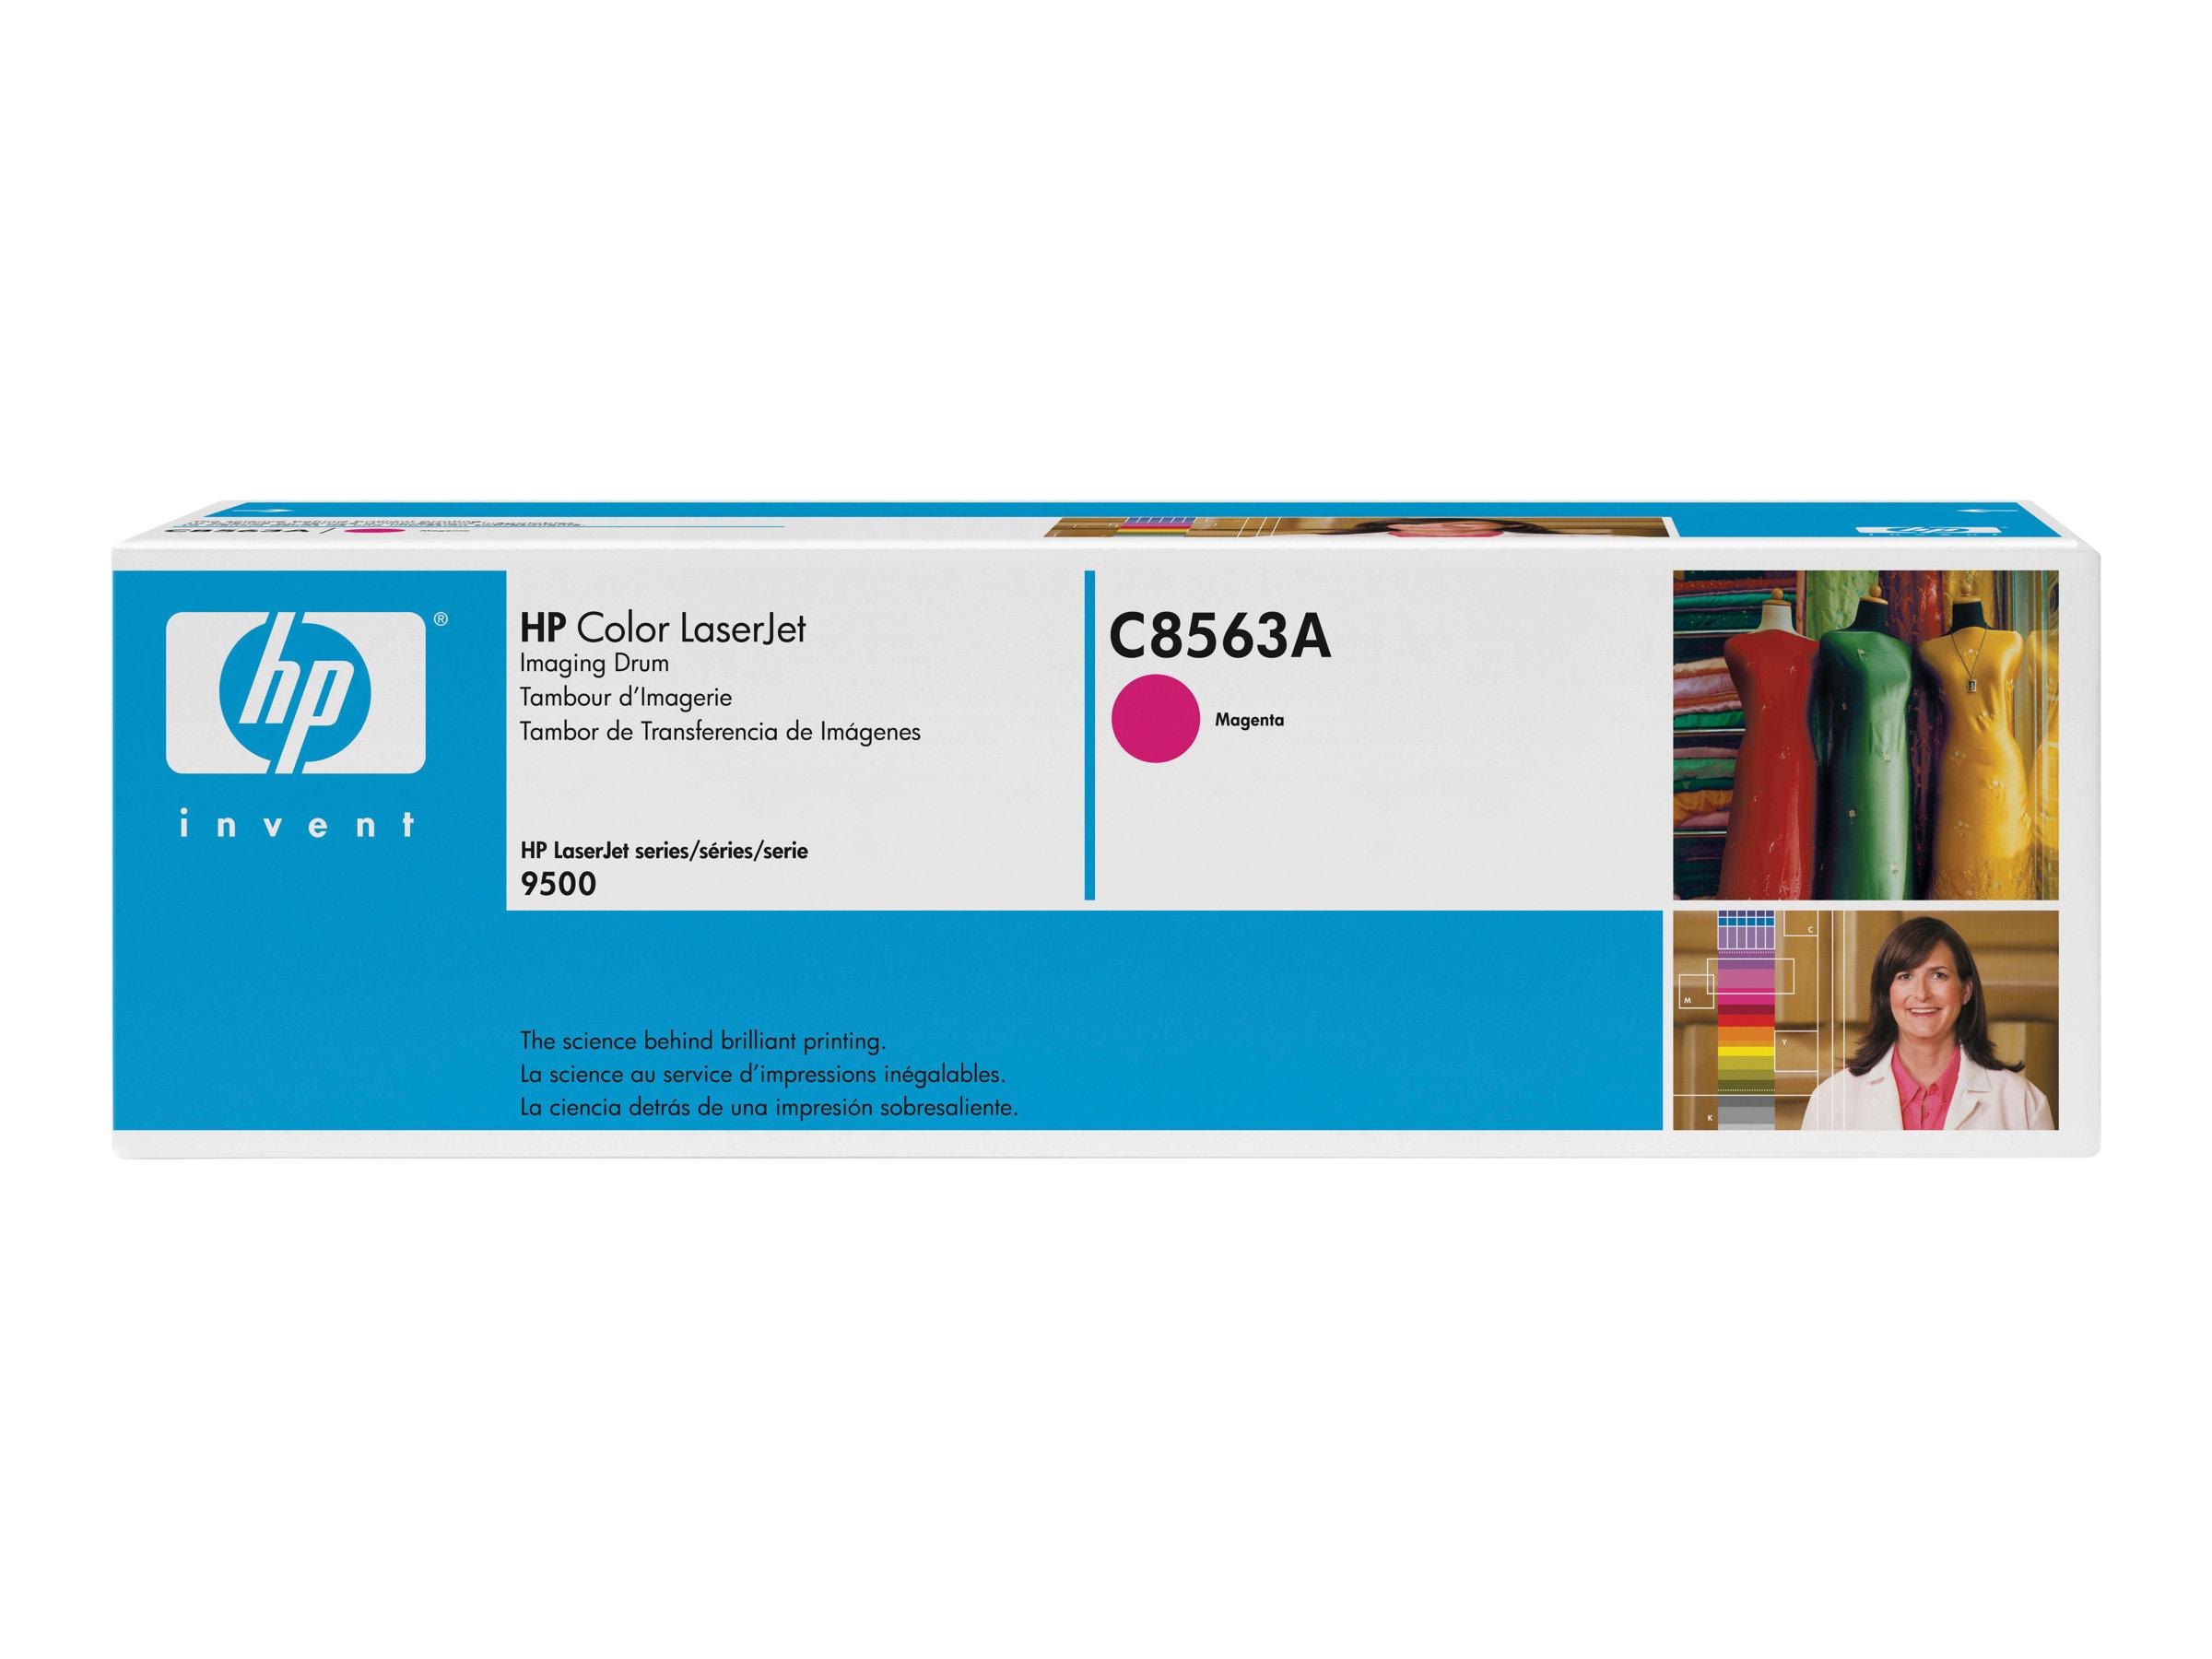 HP 822A - Magenta - Original - Trommel-Kit - für Color LaserJet 9500gp, 9500hdn, 9500mfp, 9500n